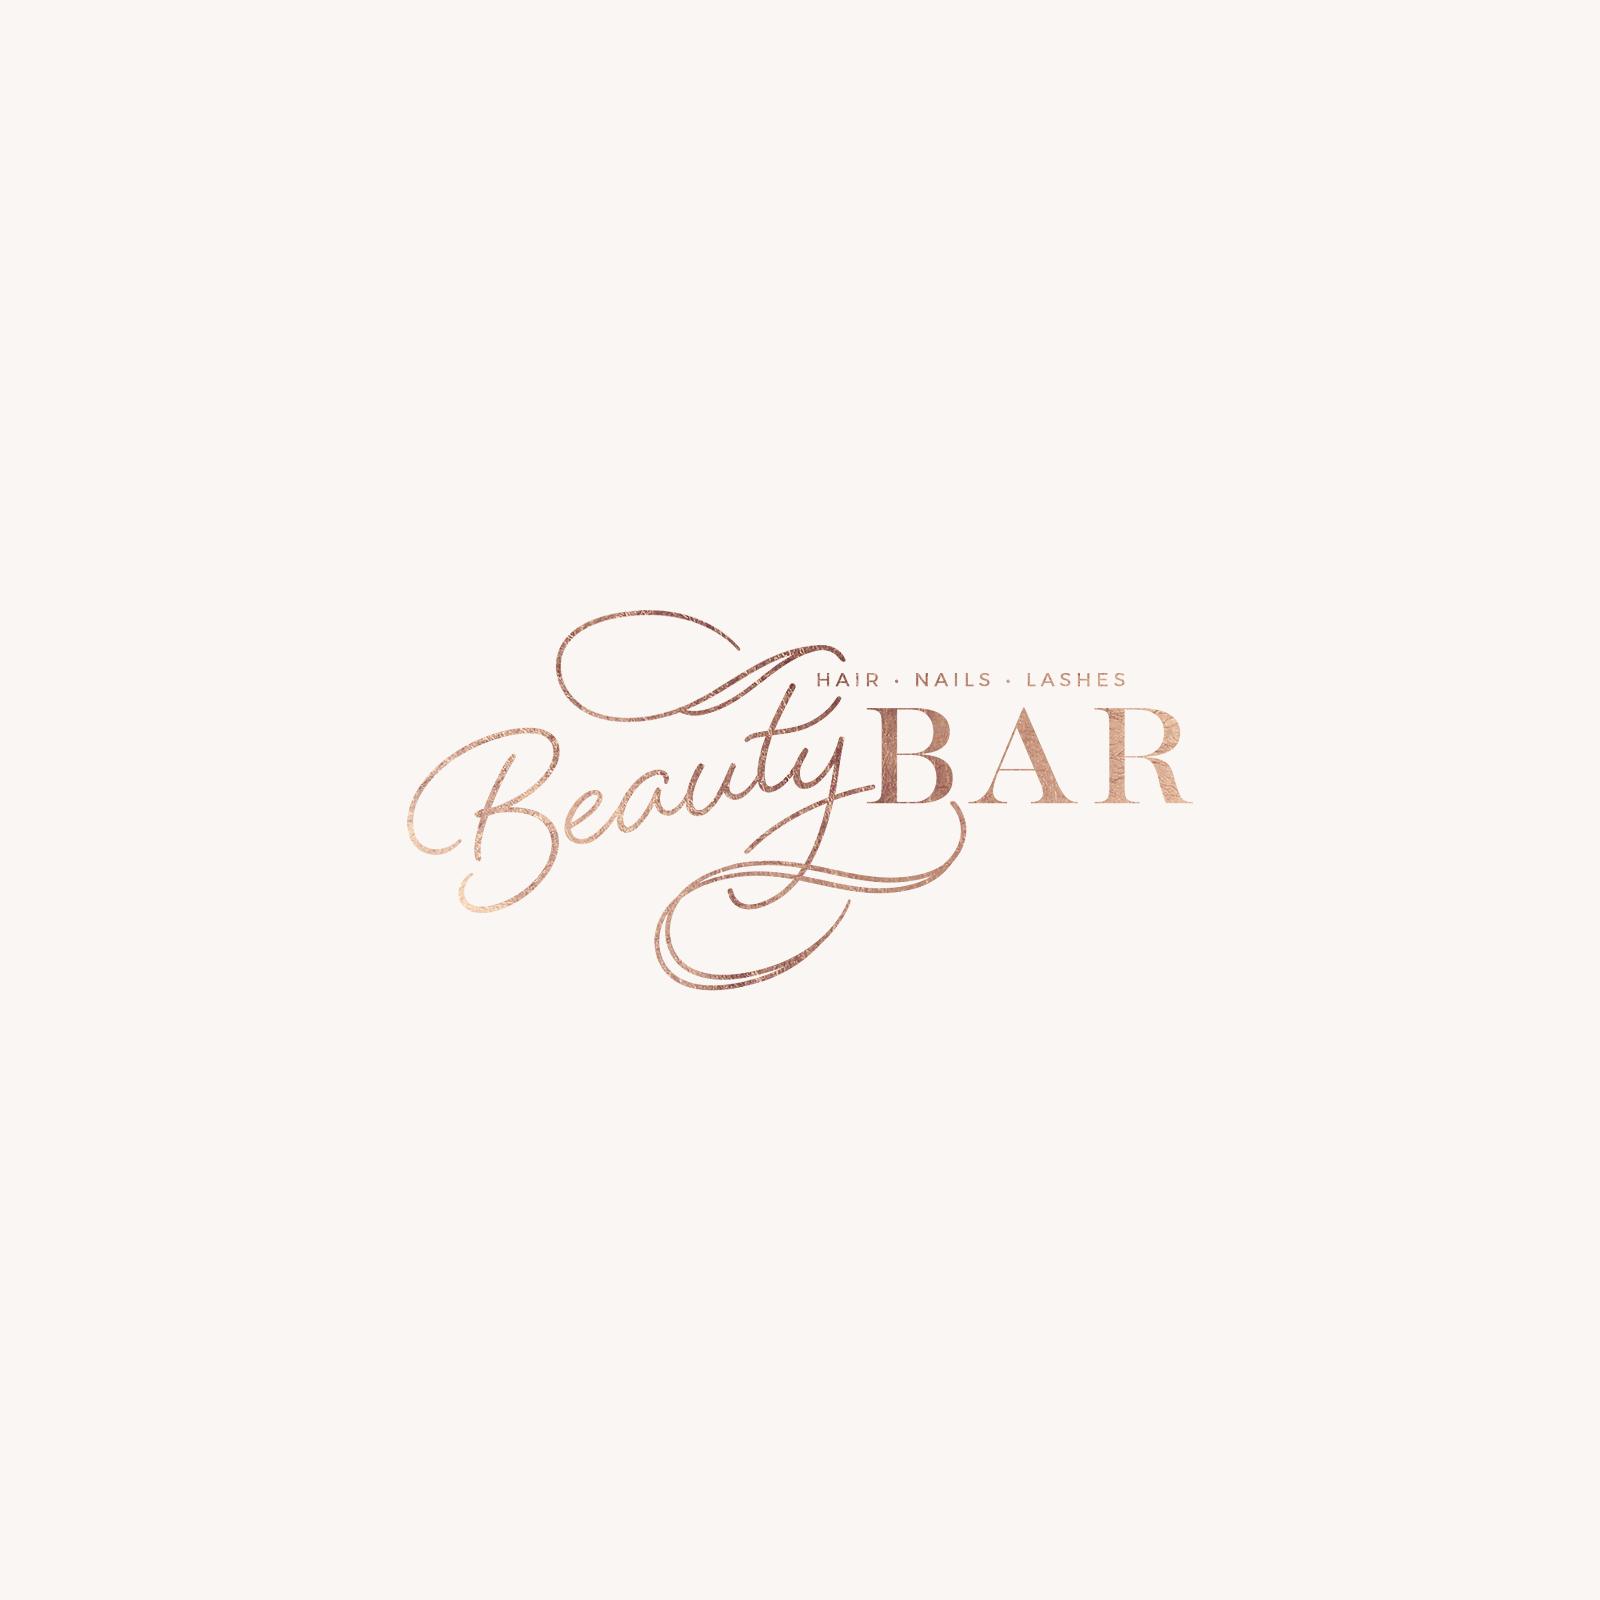 Beauty Bar Beauty salon logo, Spa logo, Elegant logo design